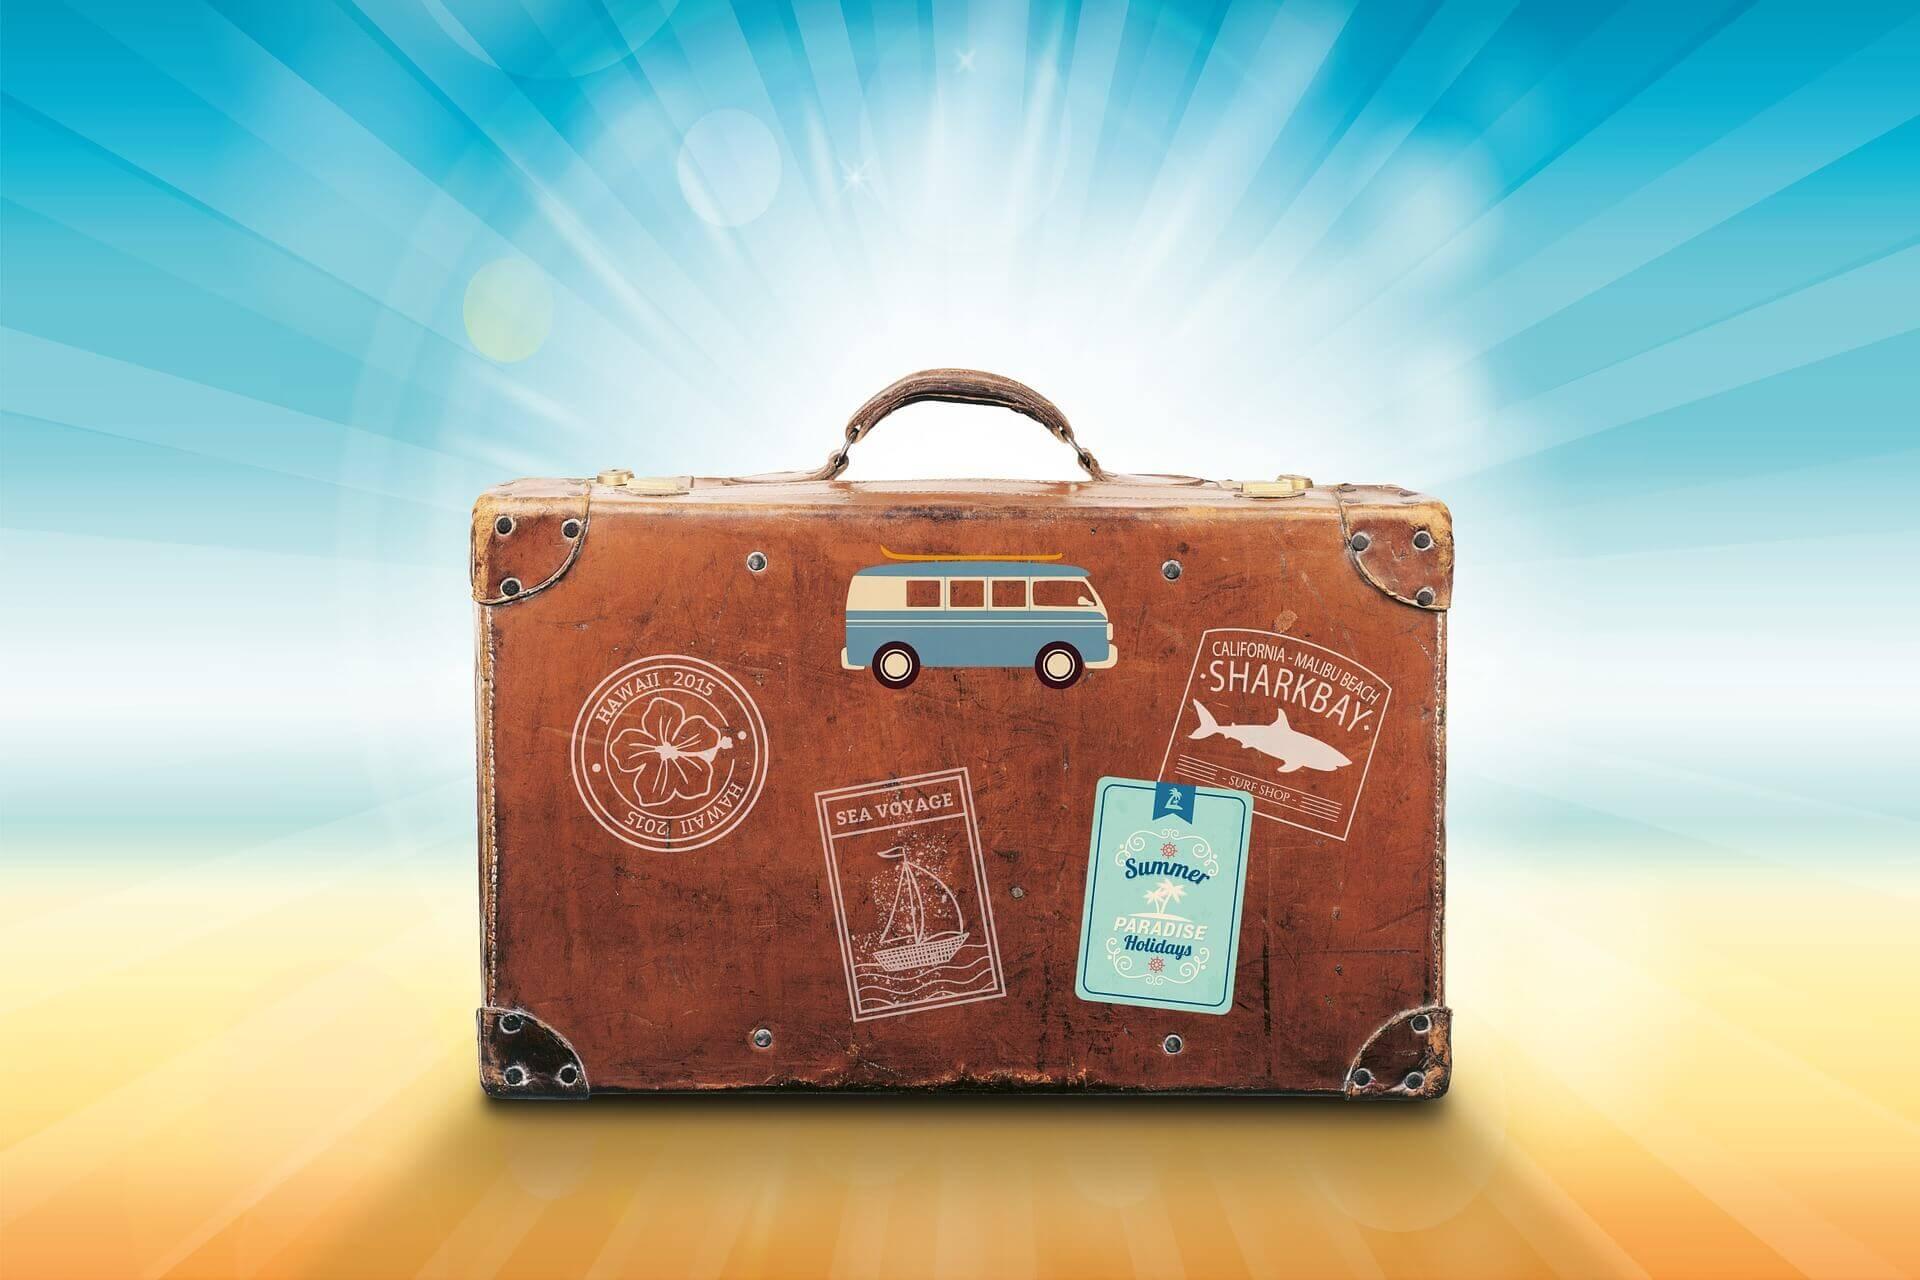 Maleta excursiones low cost